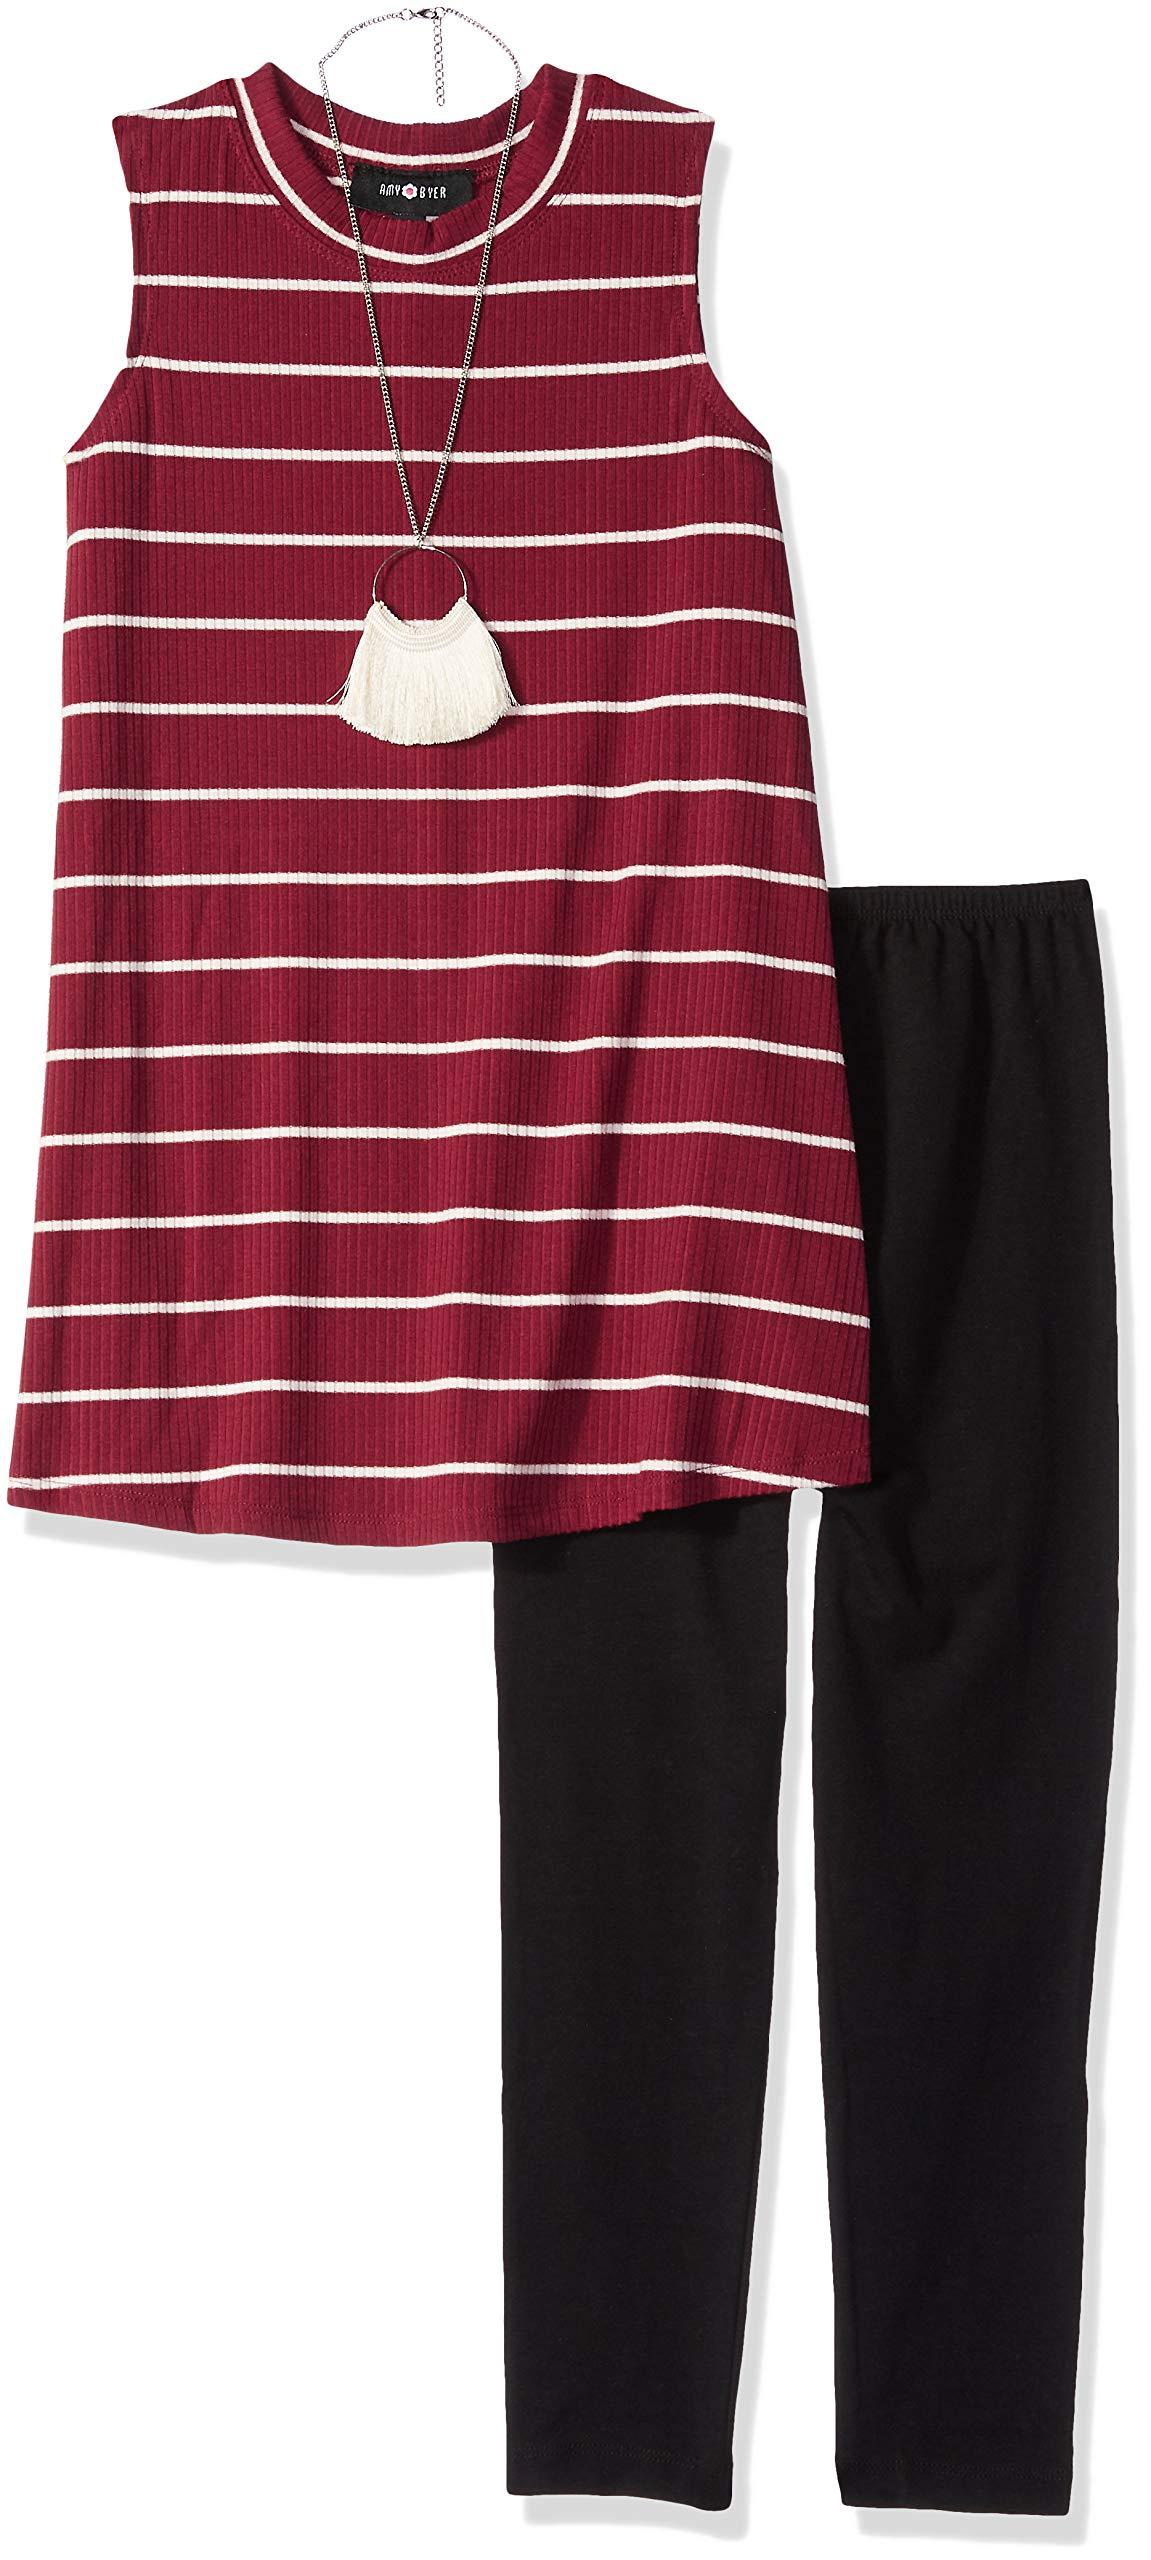 Amy Byer Big Girls' Sleeveless Tunic and Legging Outfit Set, Boho Plum, L